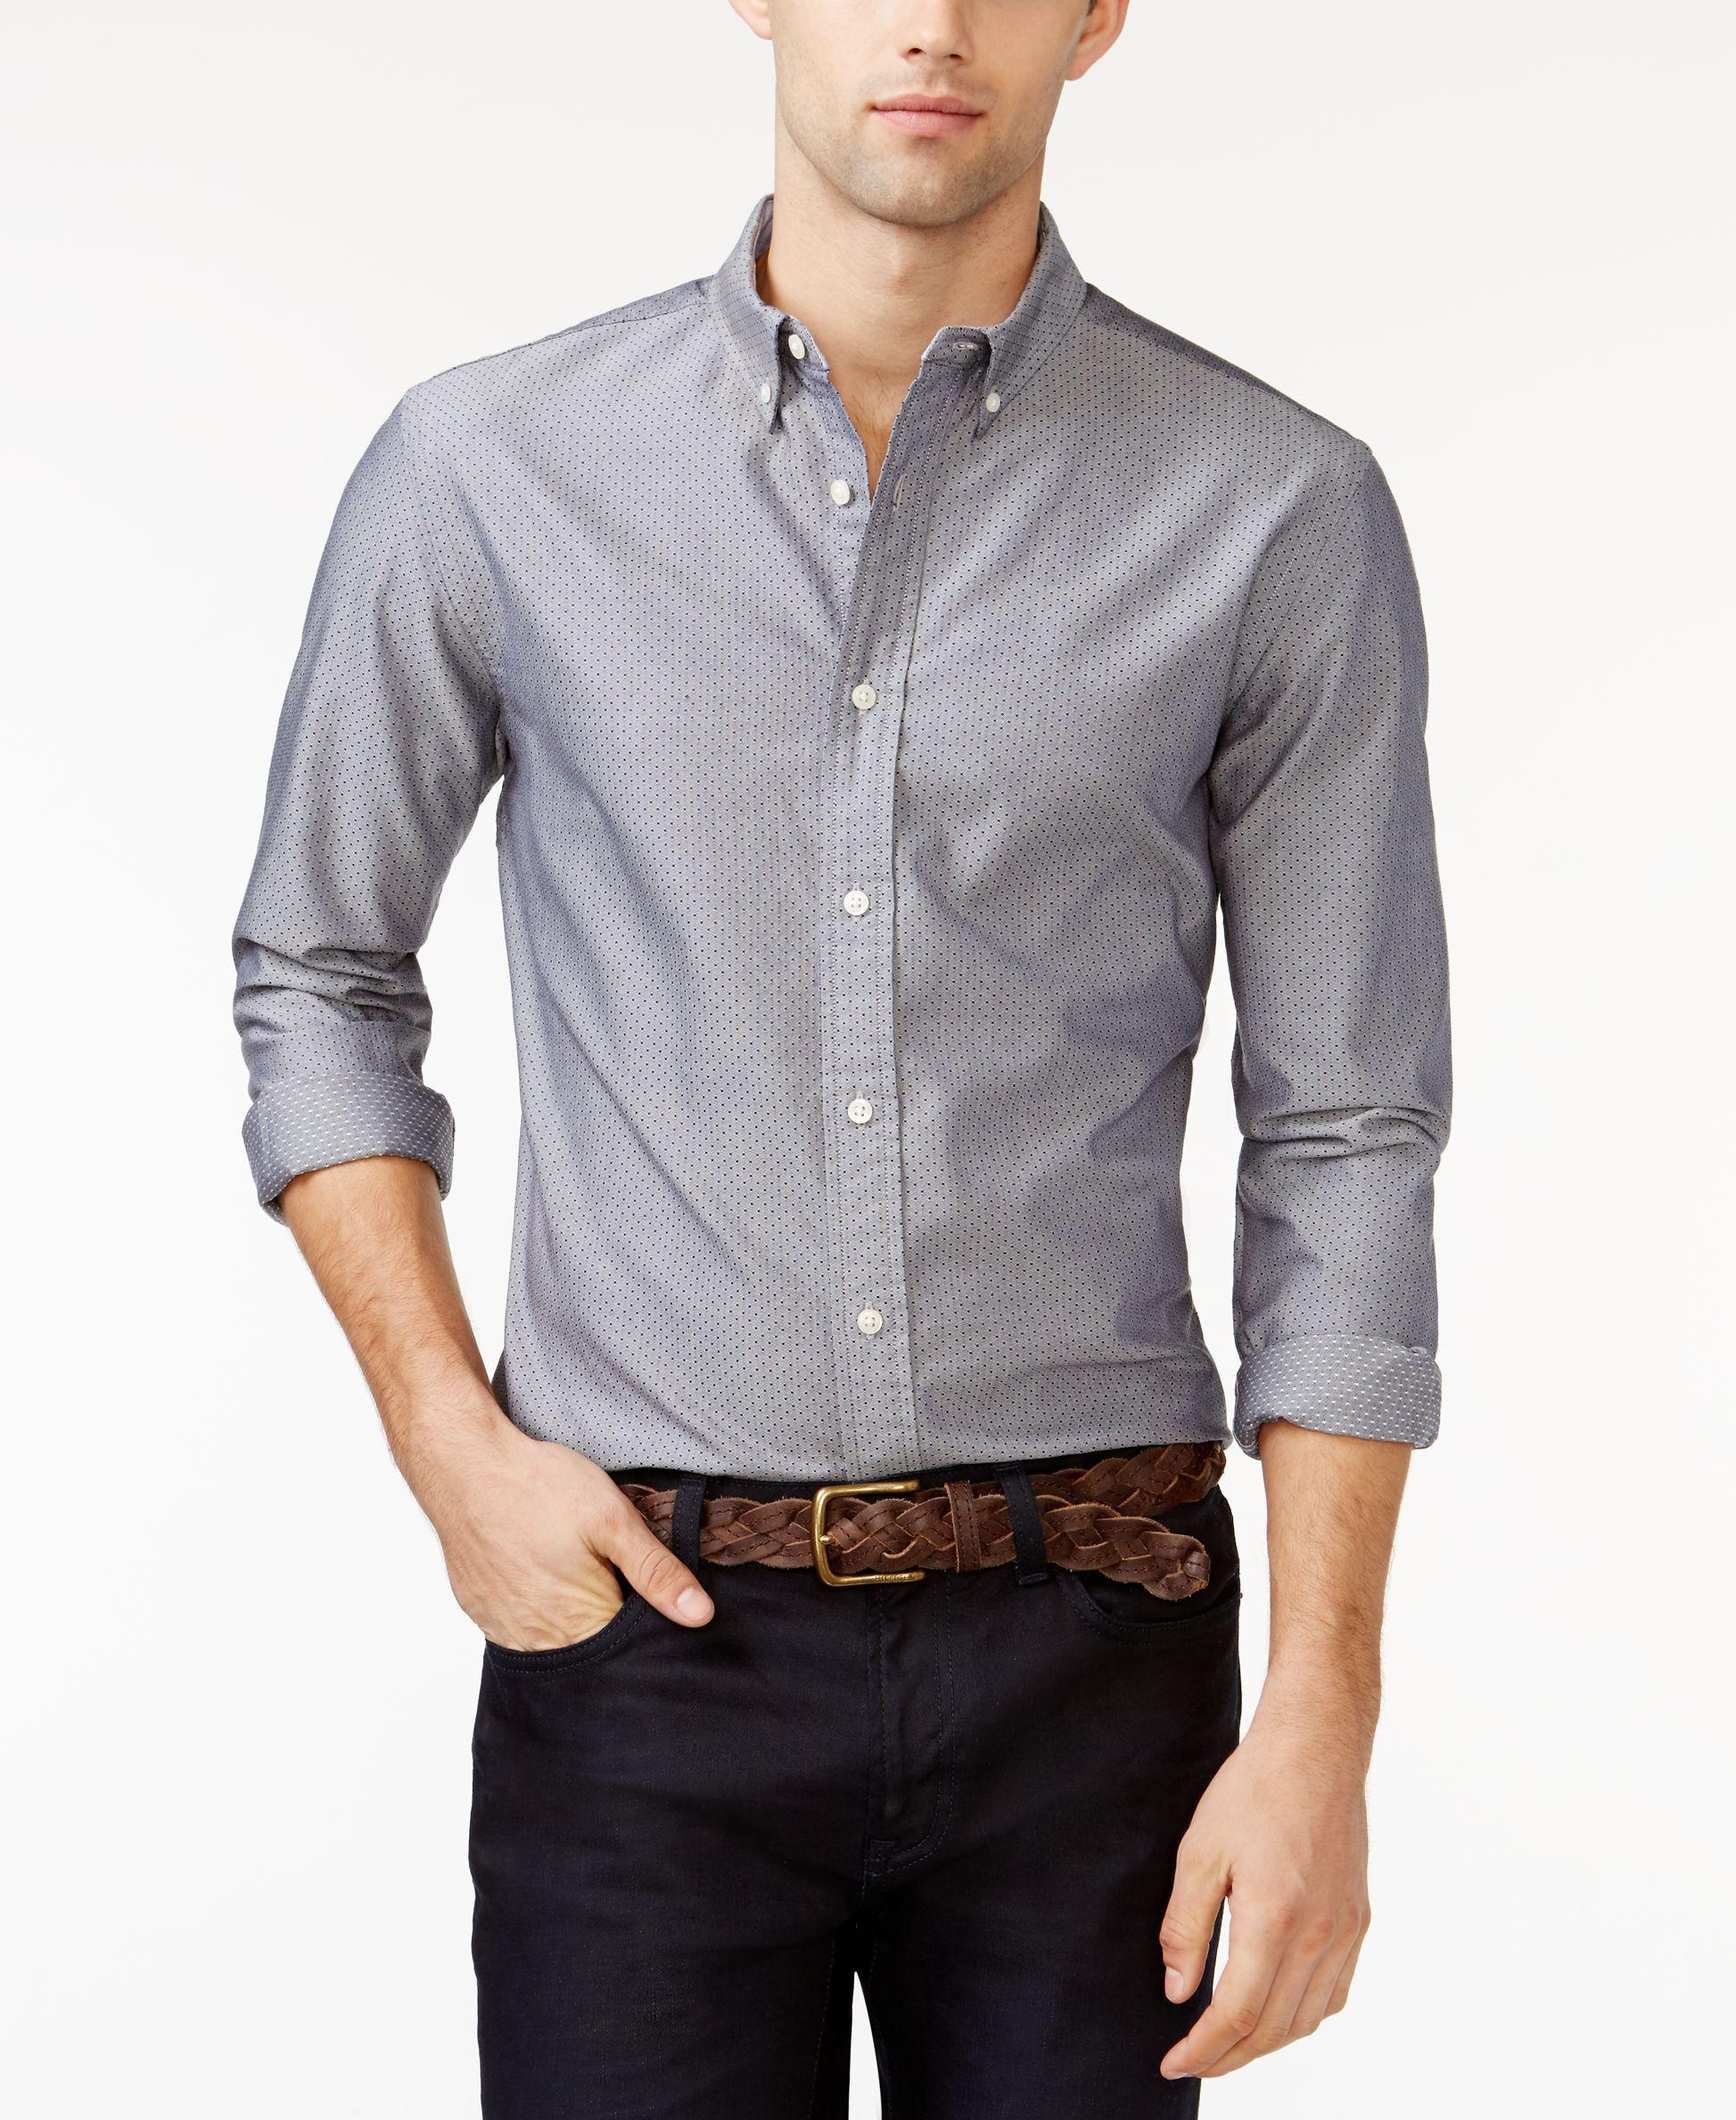 Tommy Hilfiger Dean Micro Dot Shirt Belts Tommy Hilfiger Shirts